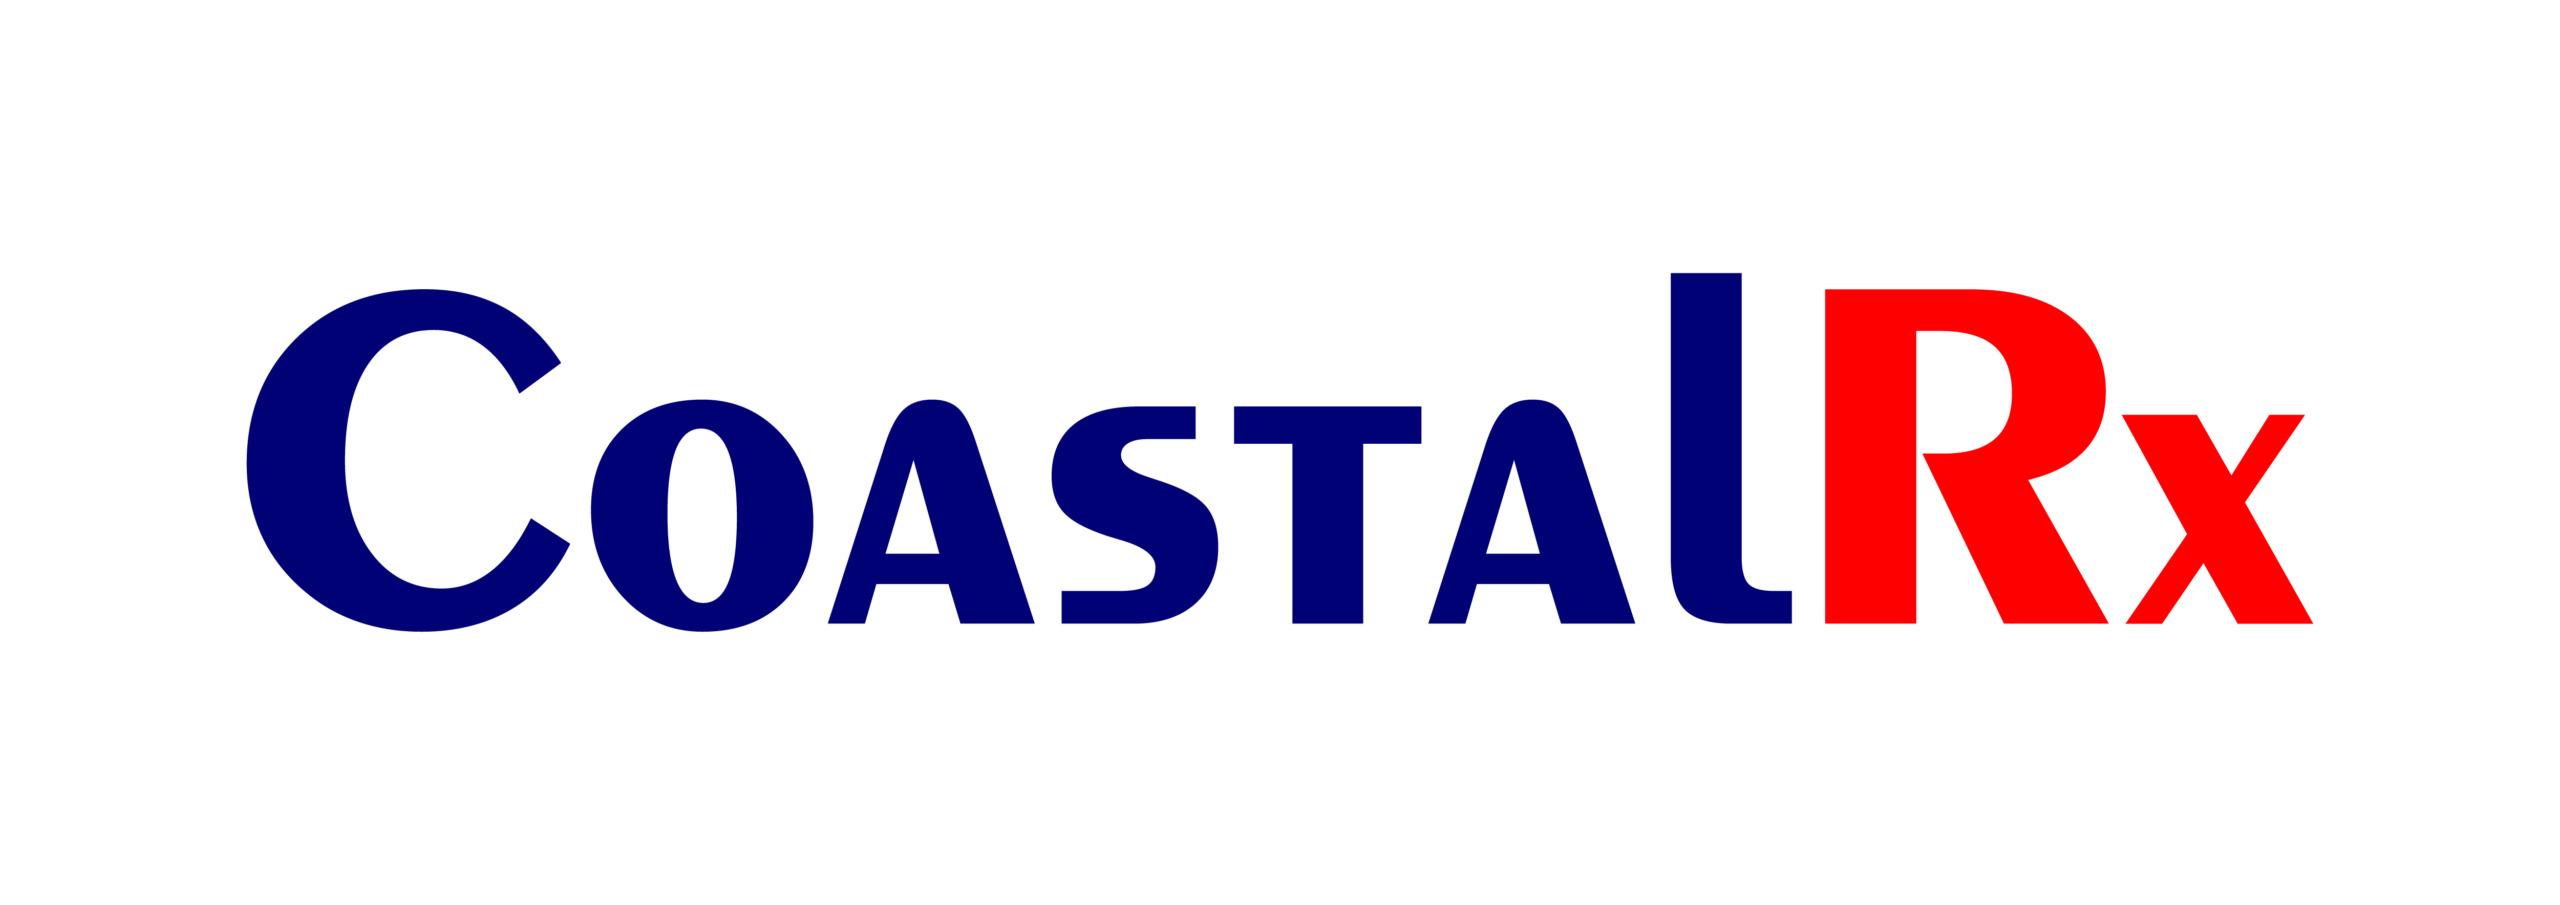 CoastalRx